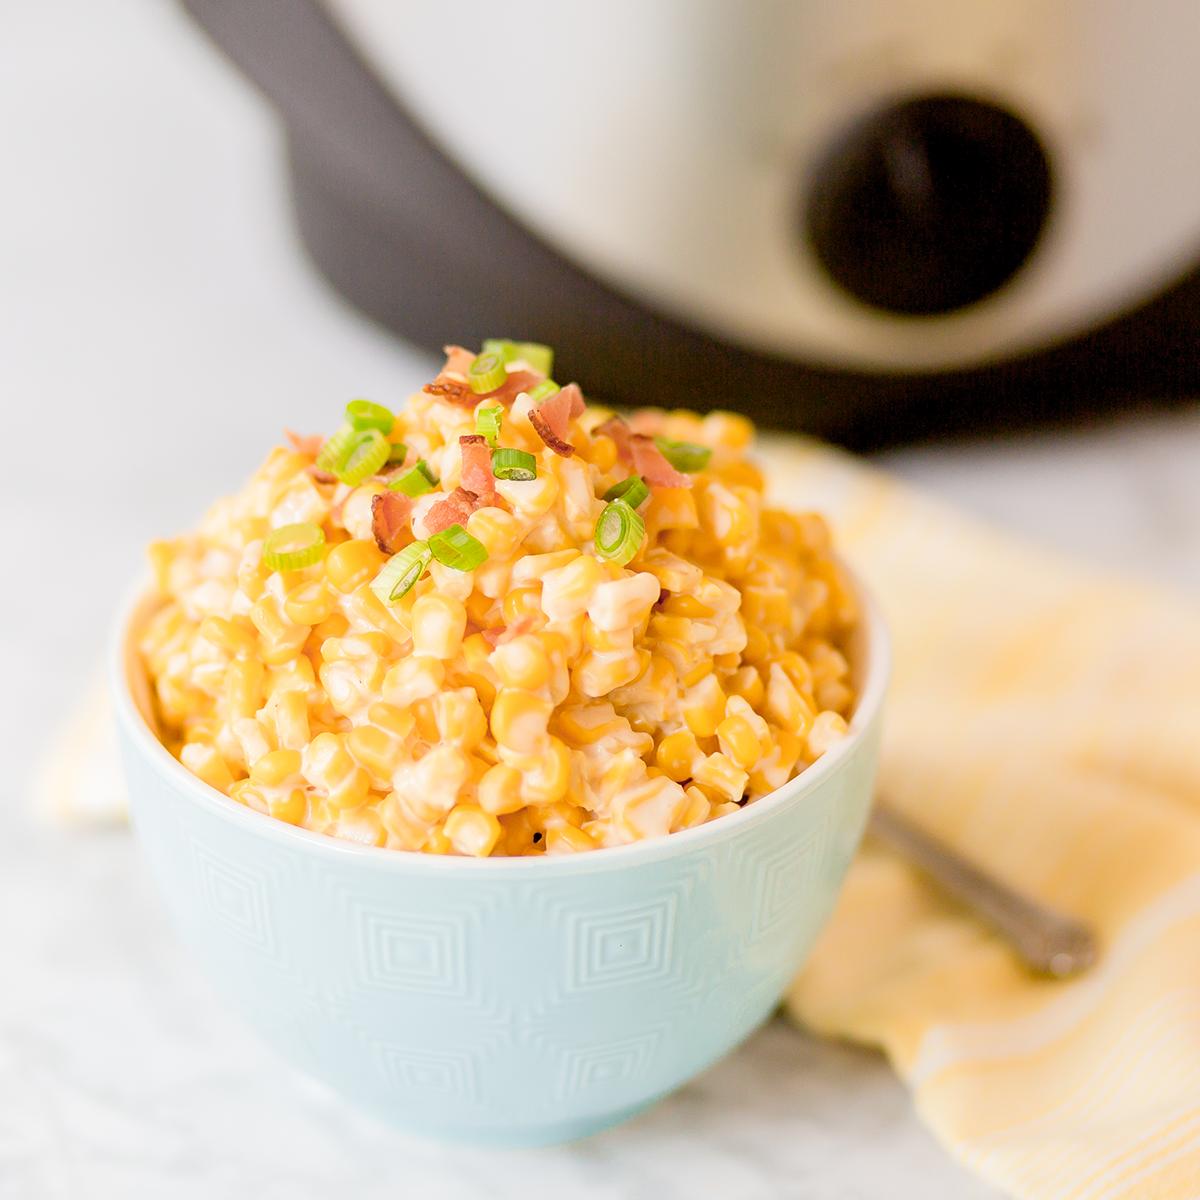 Crockpot Cream Cheese Corn Recipe